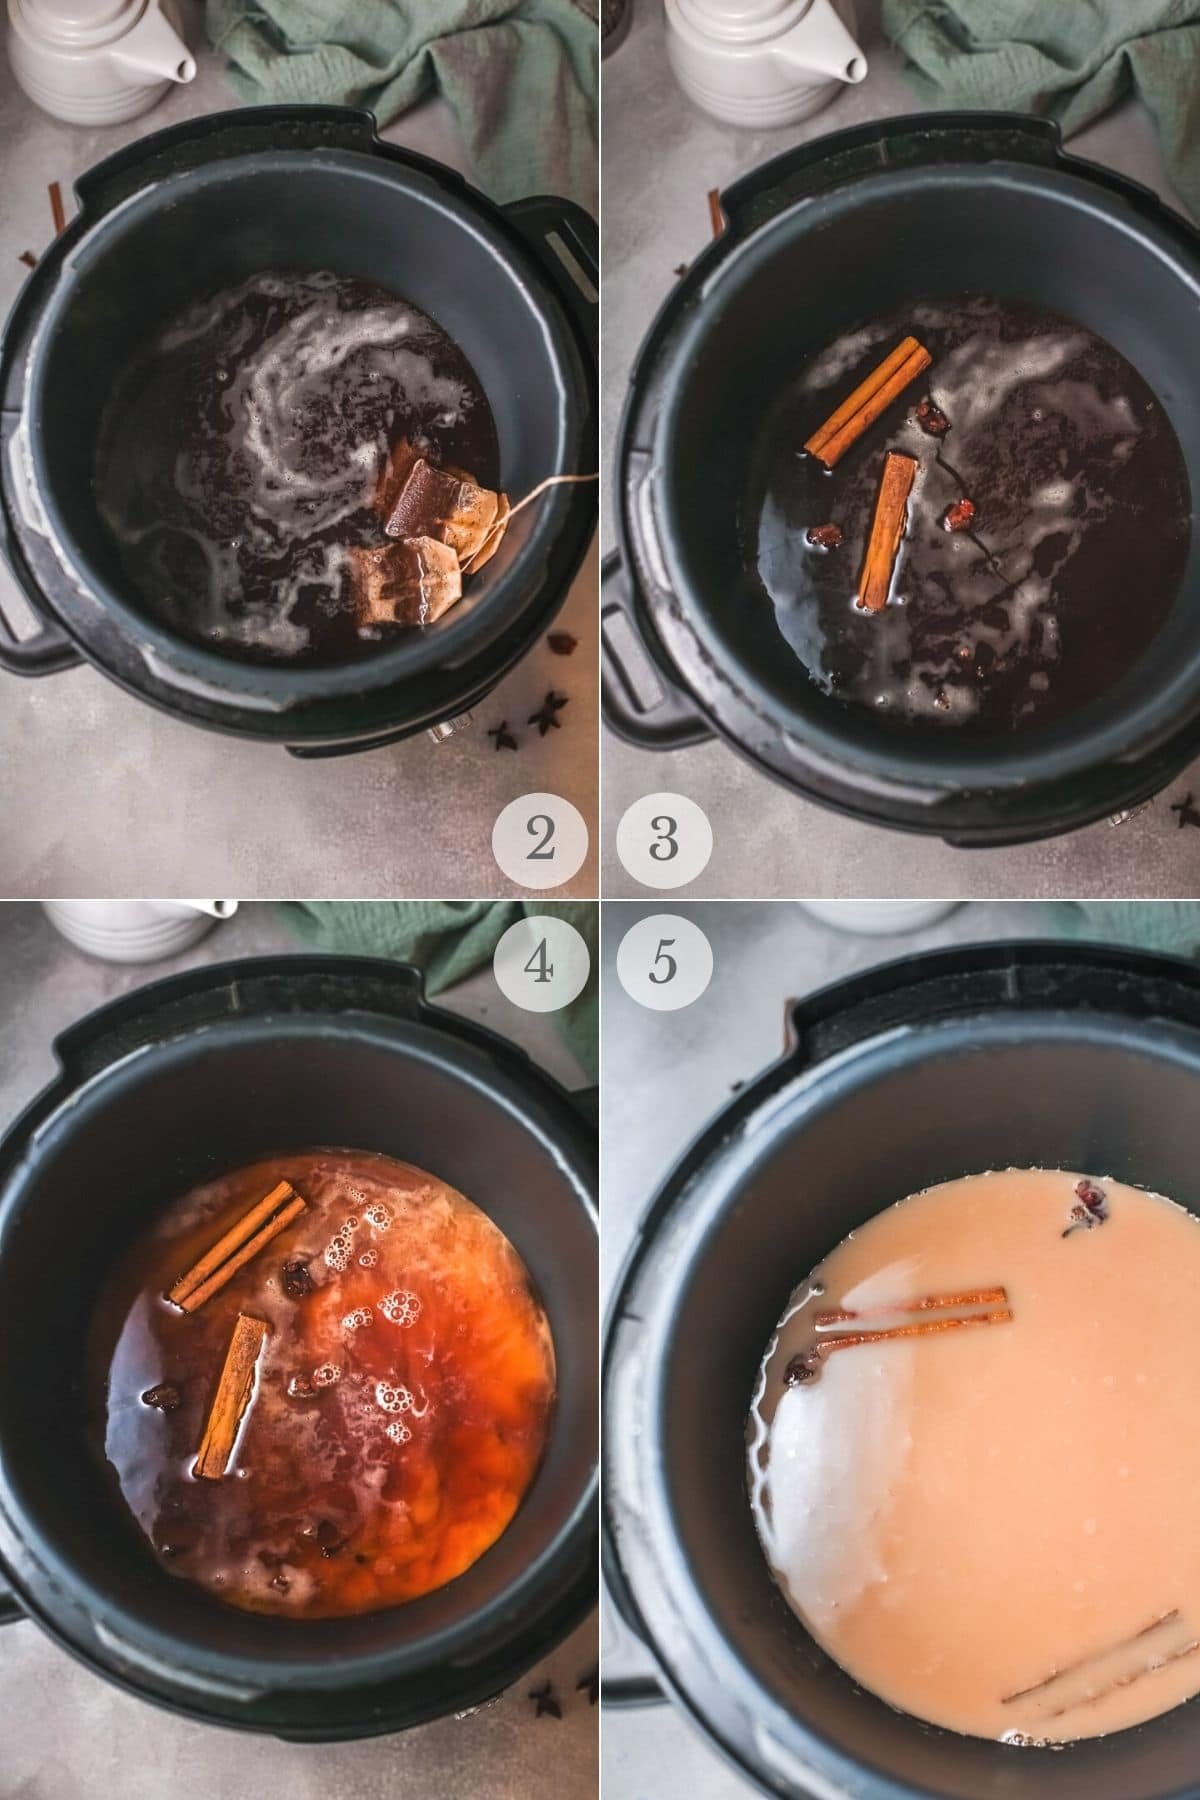 chai masala recipe steps 2-5